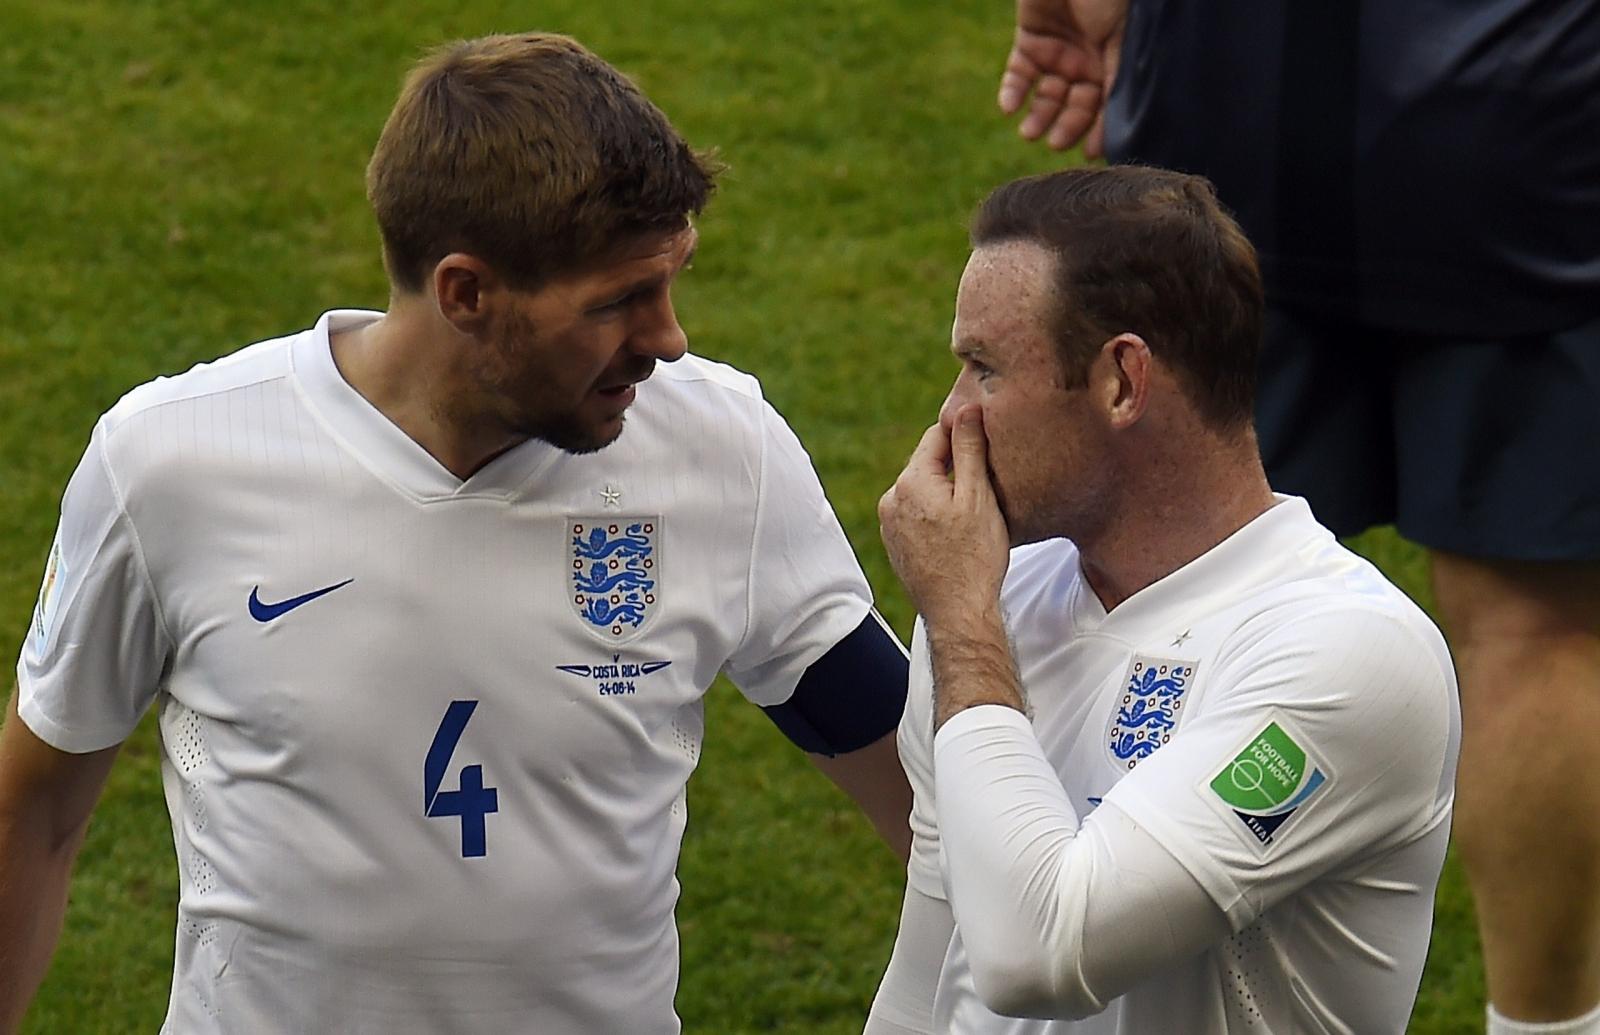 Wayne Rooney and Steven Gerrard